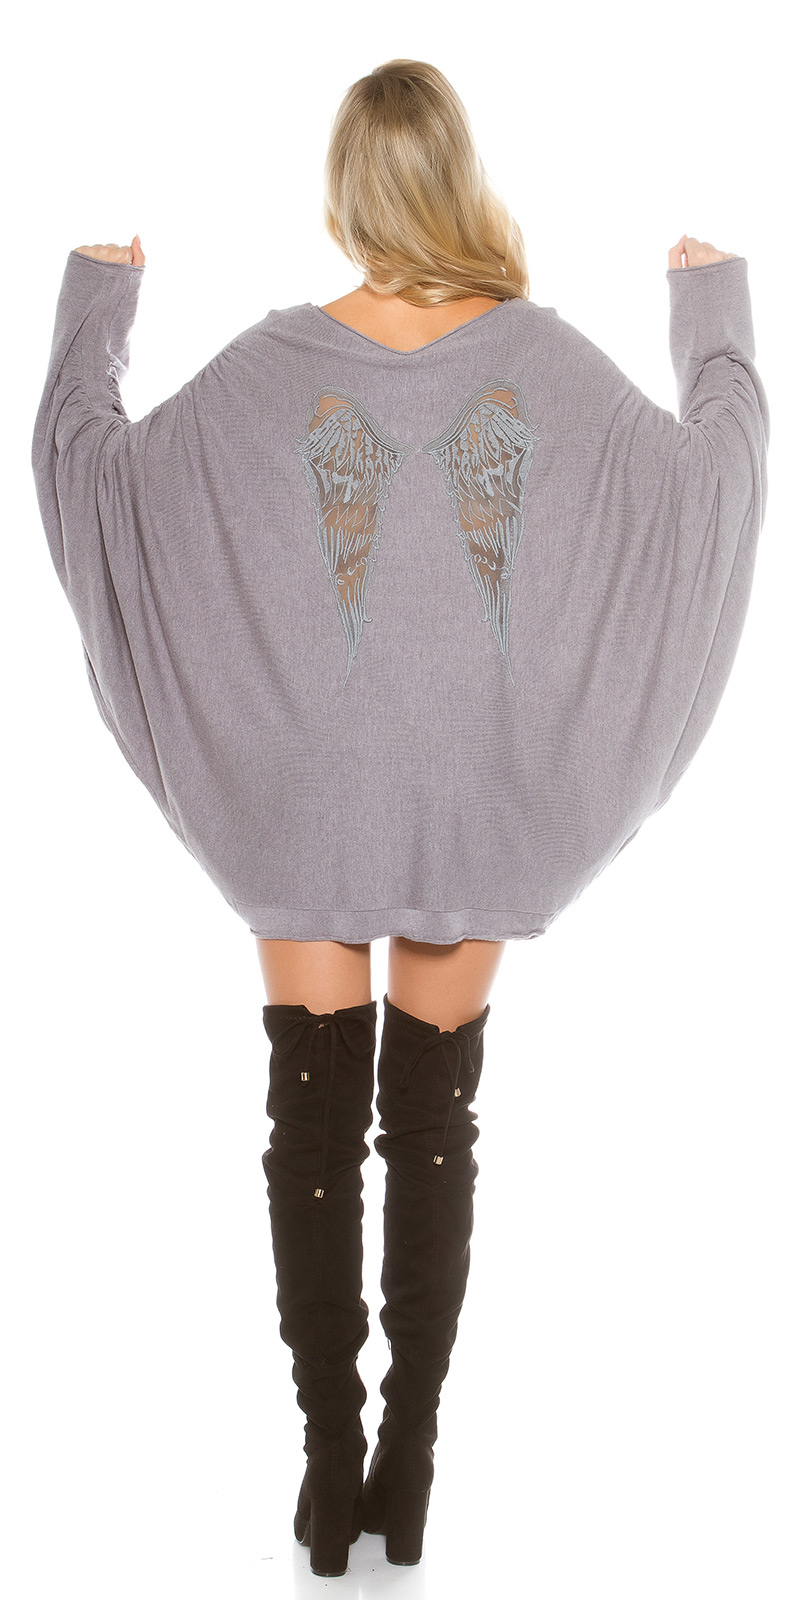 Pulover la moda supradimensionat Bat